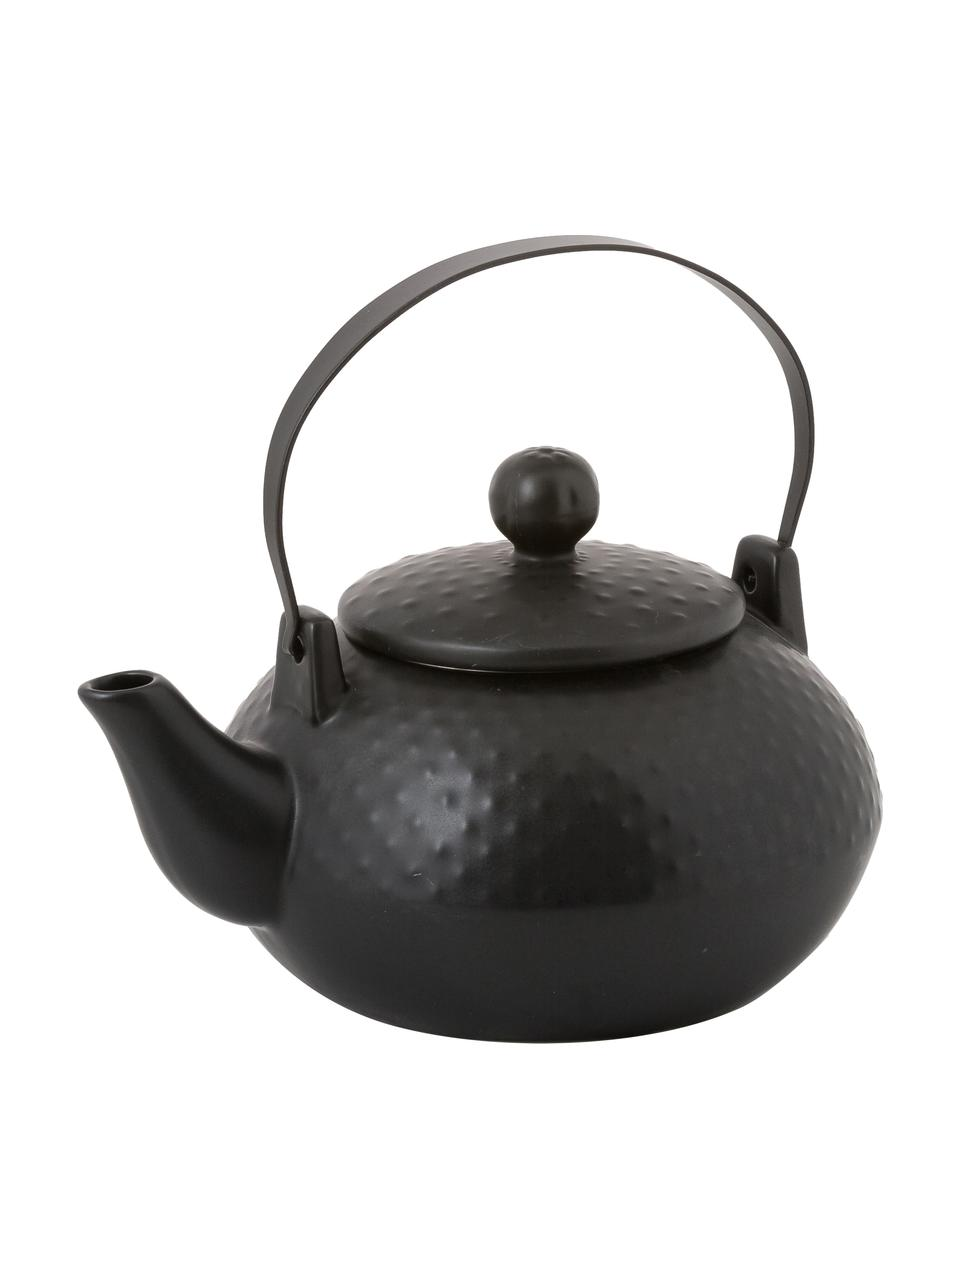 Servizio da tè nero opaco 6 pz, Nero, Set in varie misure